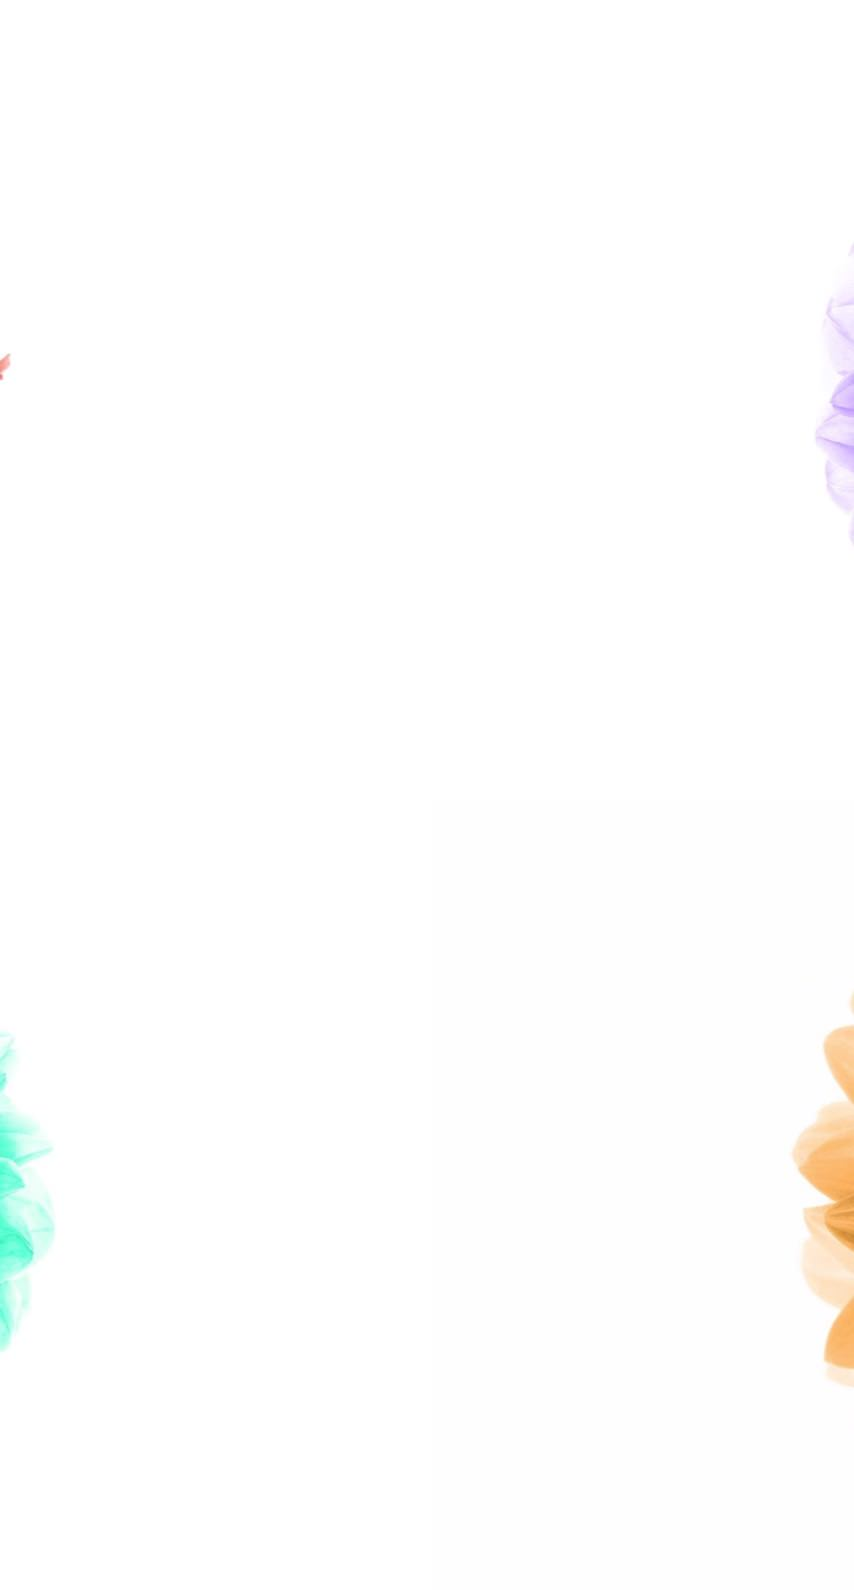 Ios9花画像白クール Wallpaper Sc Iphone8壁紙